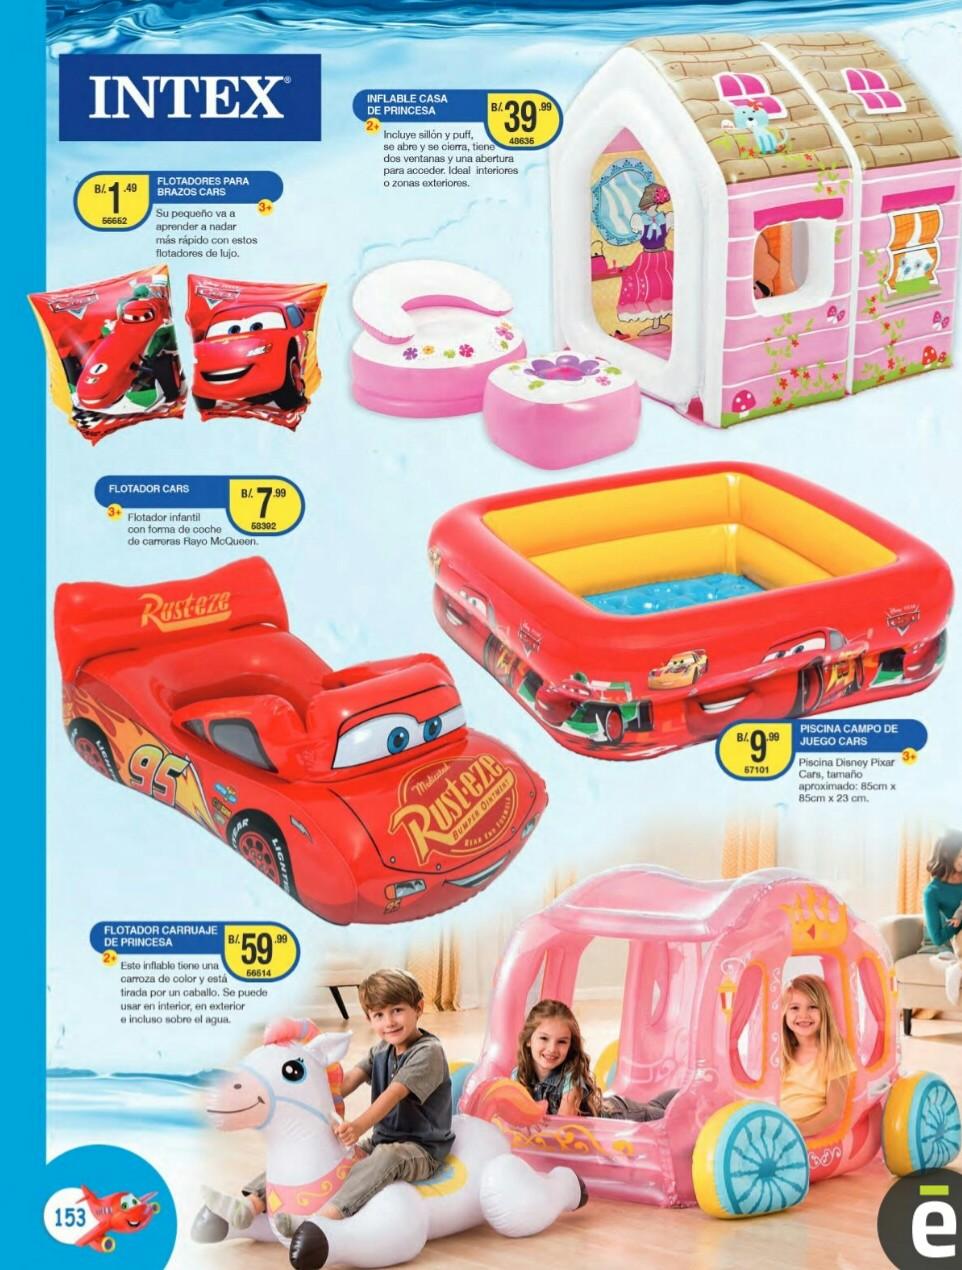 Catalogo juguetes Titan Toys 2019 p153